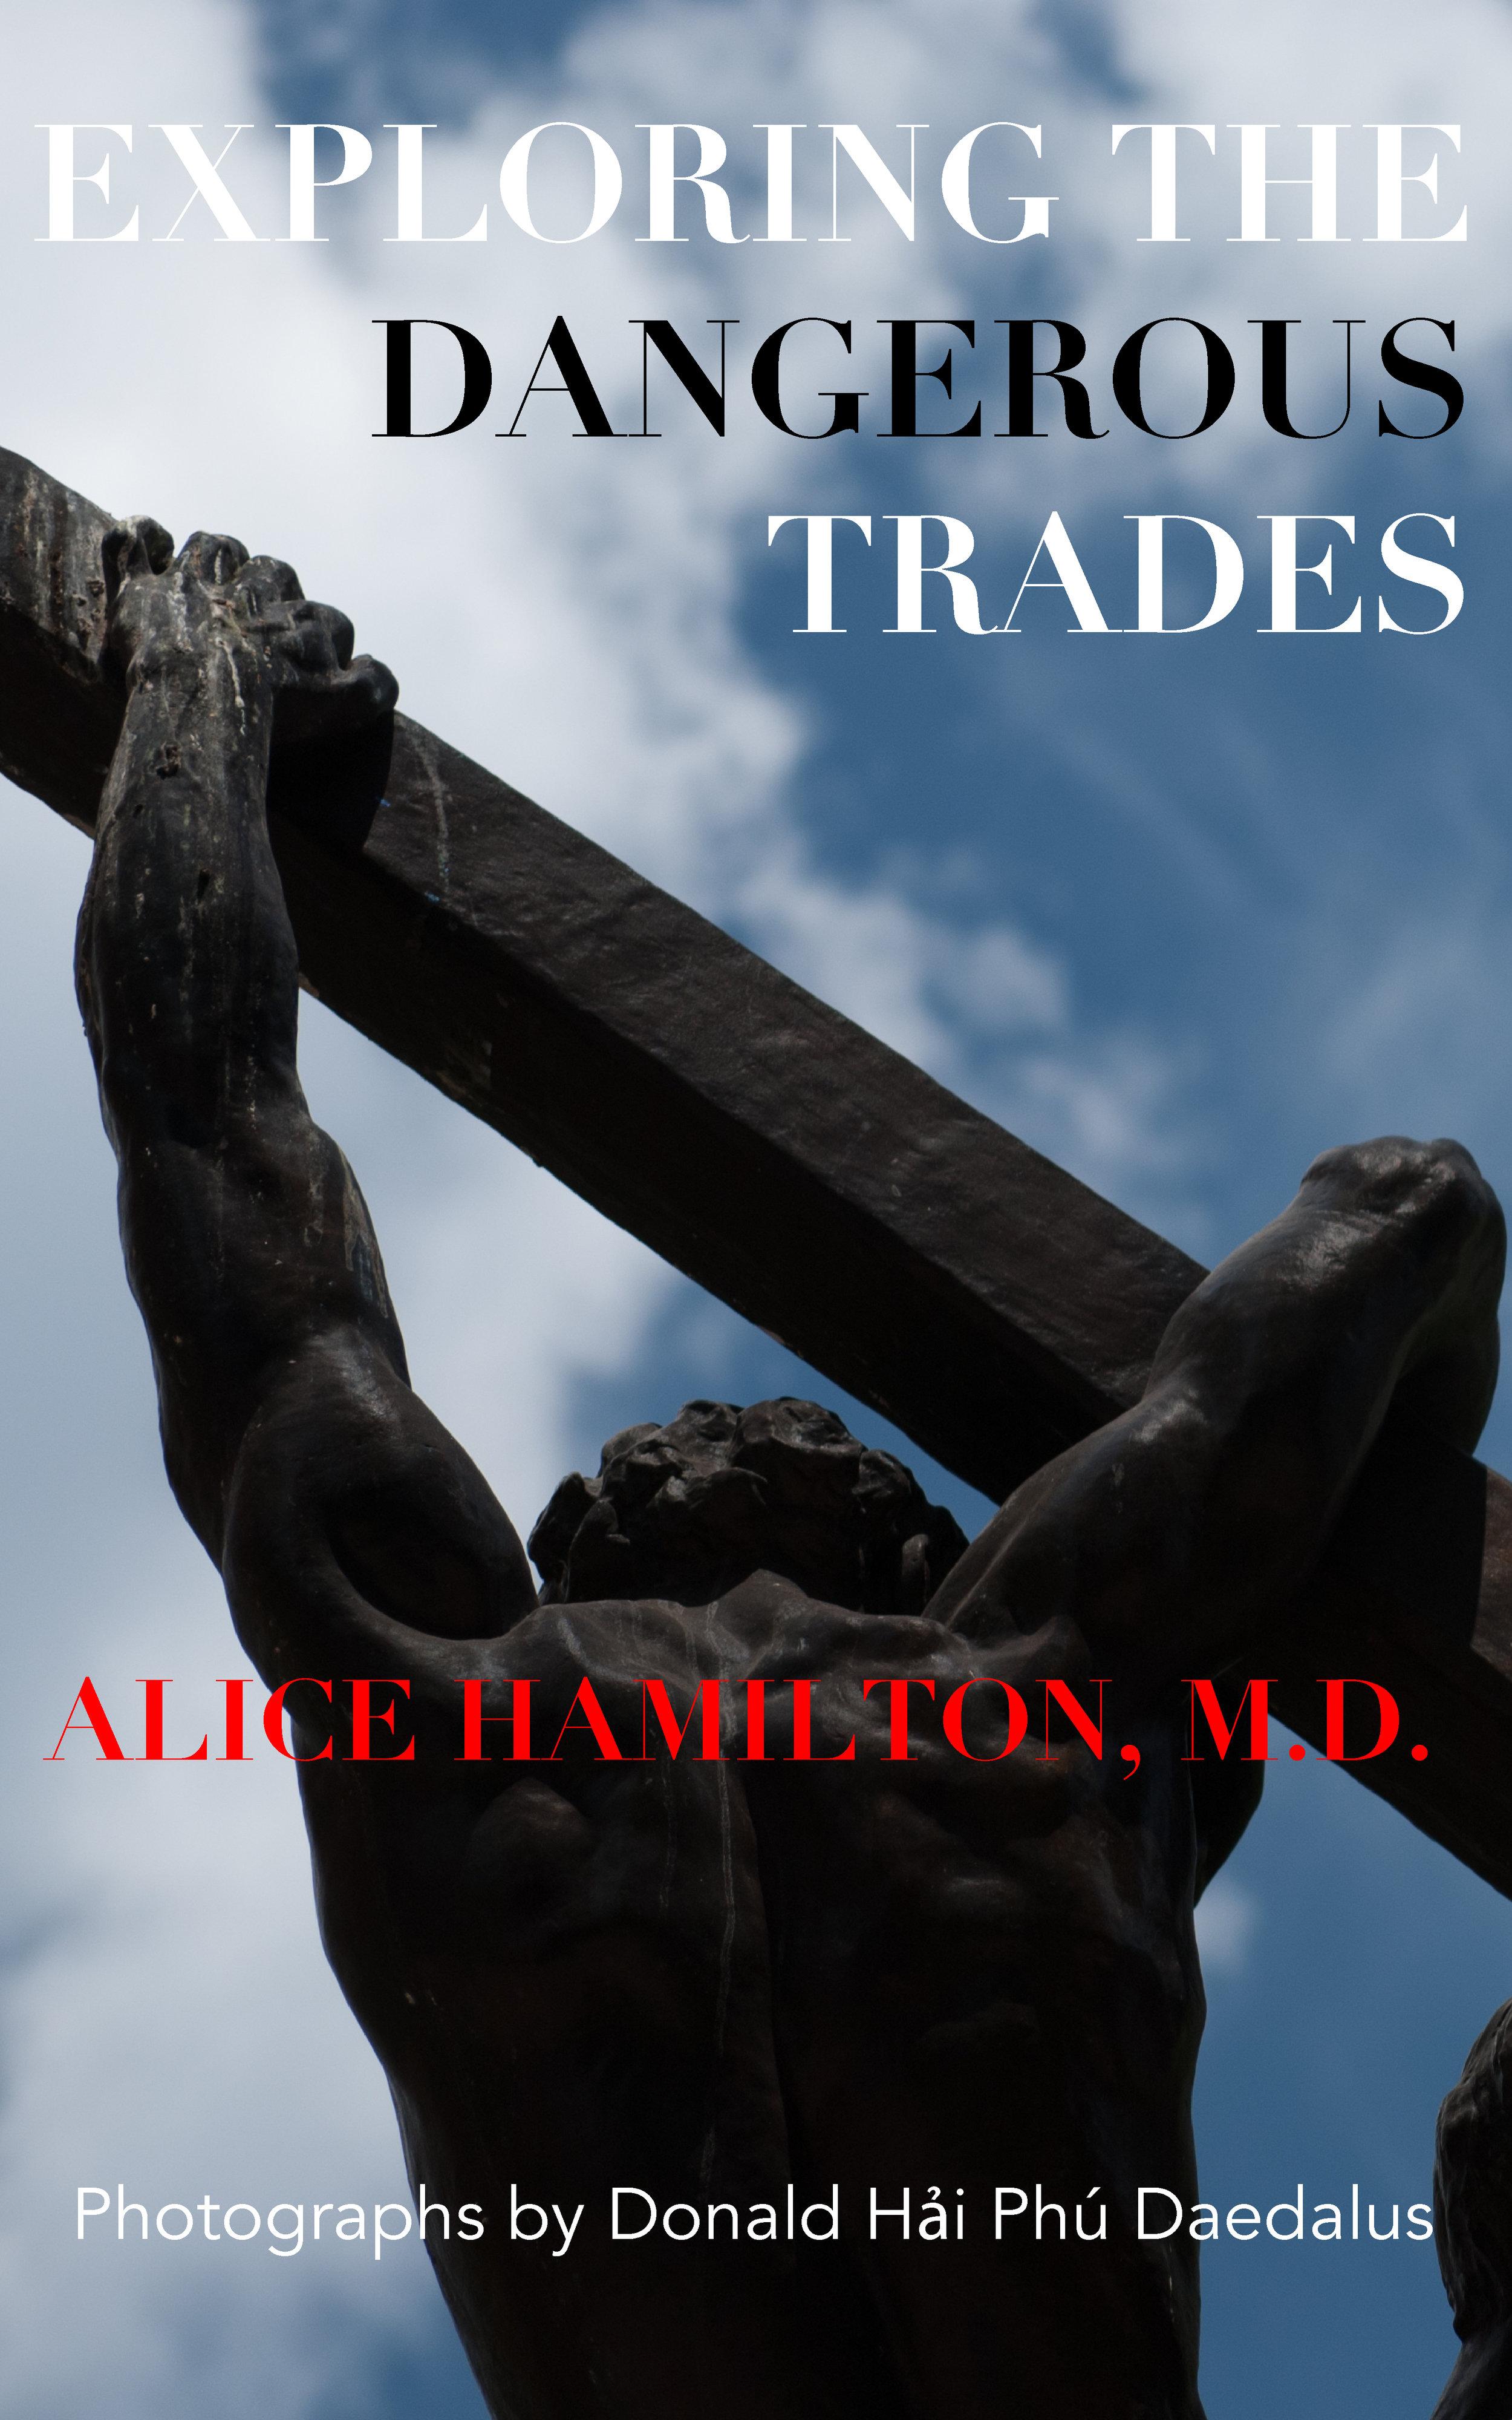 exploring the dangerous trades_cover-01.jpg